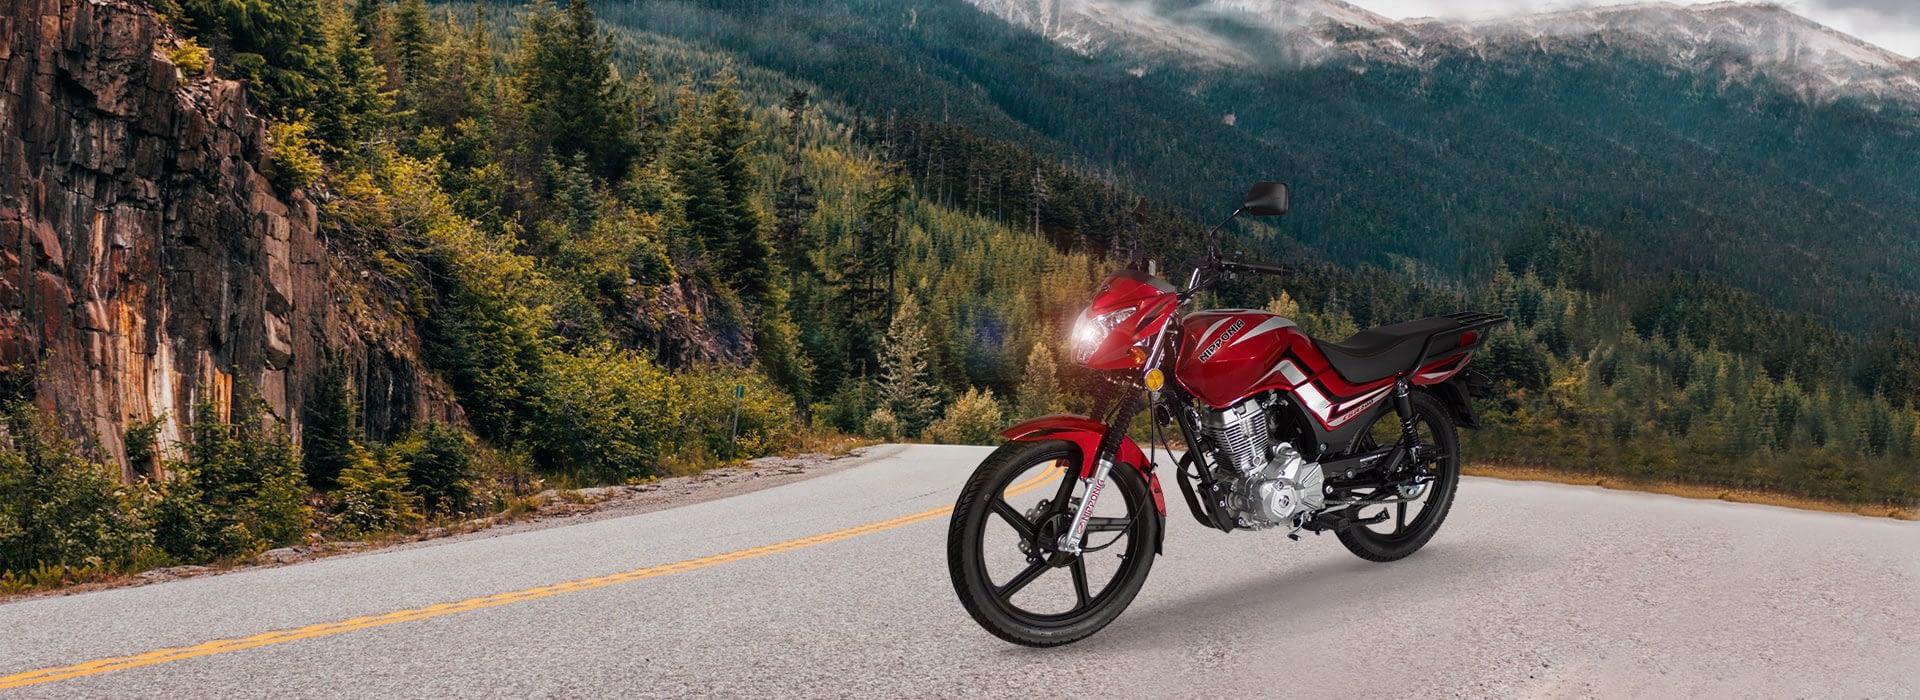 Nipponia CGR 200 Motocicletas